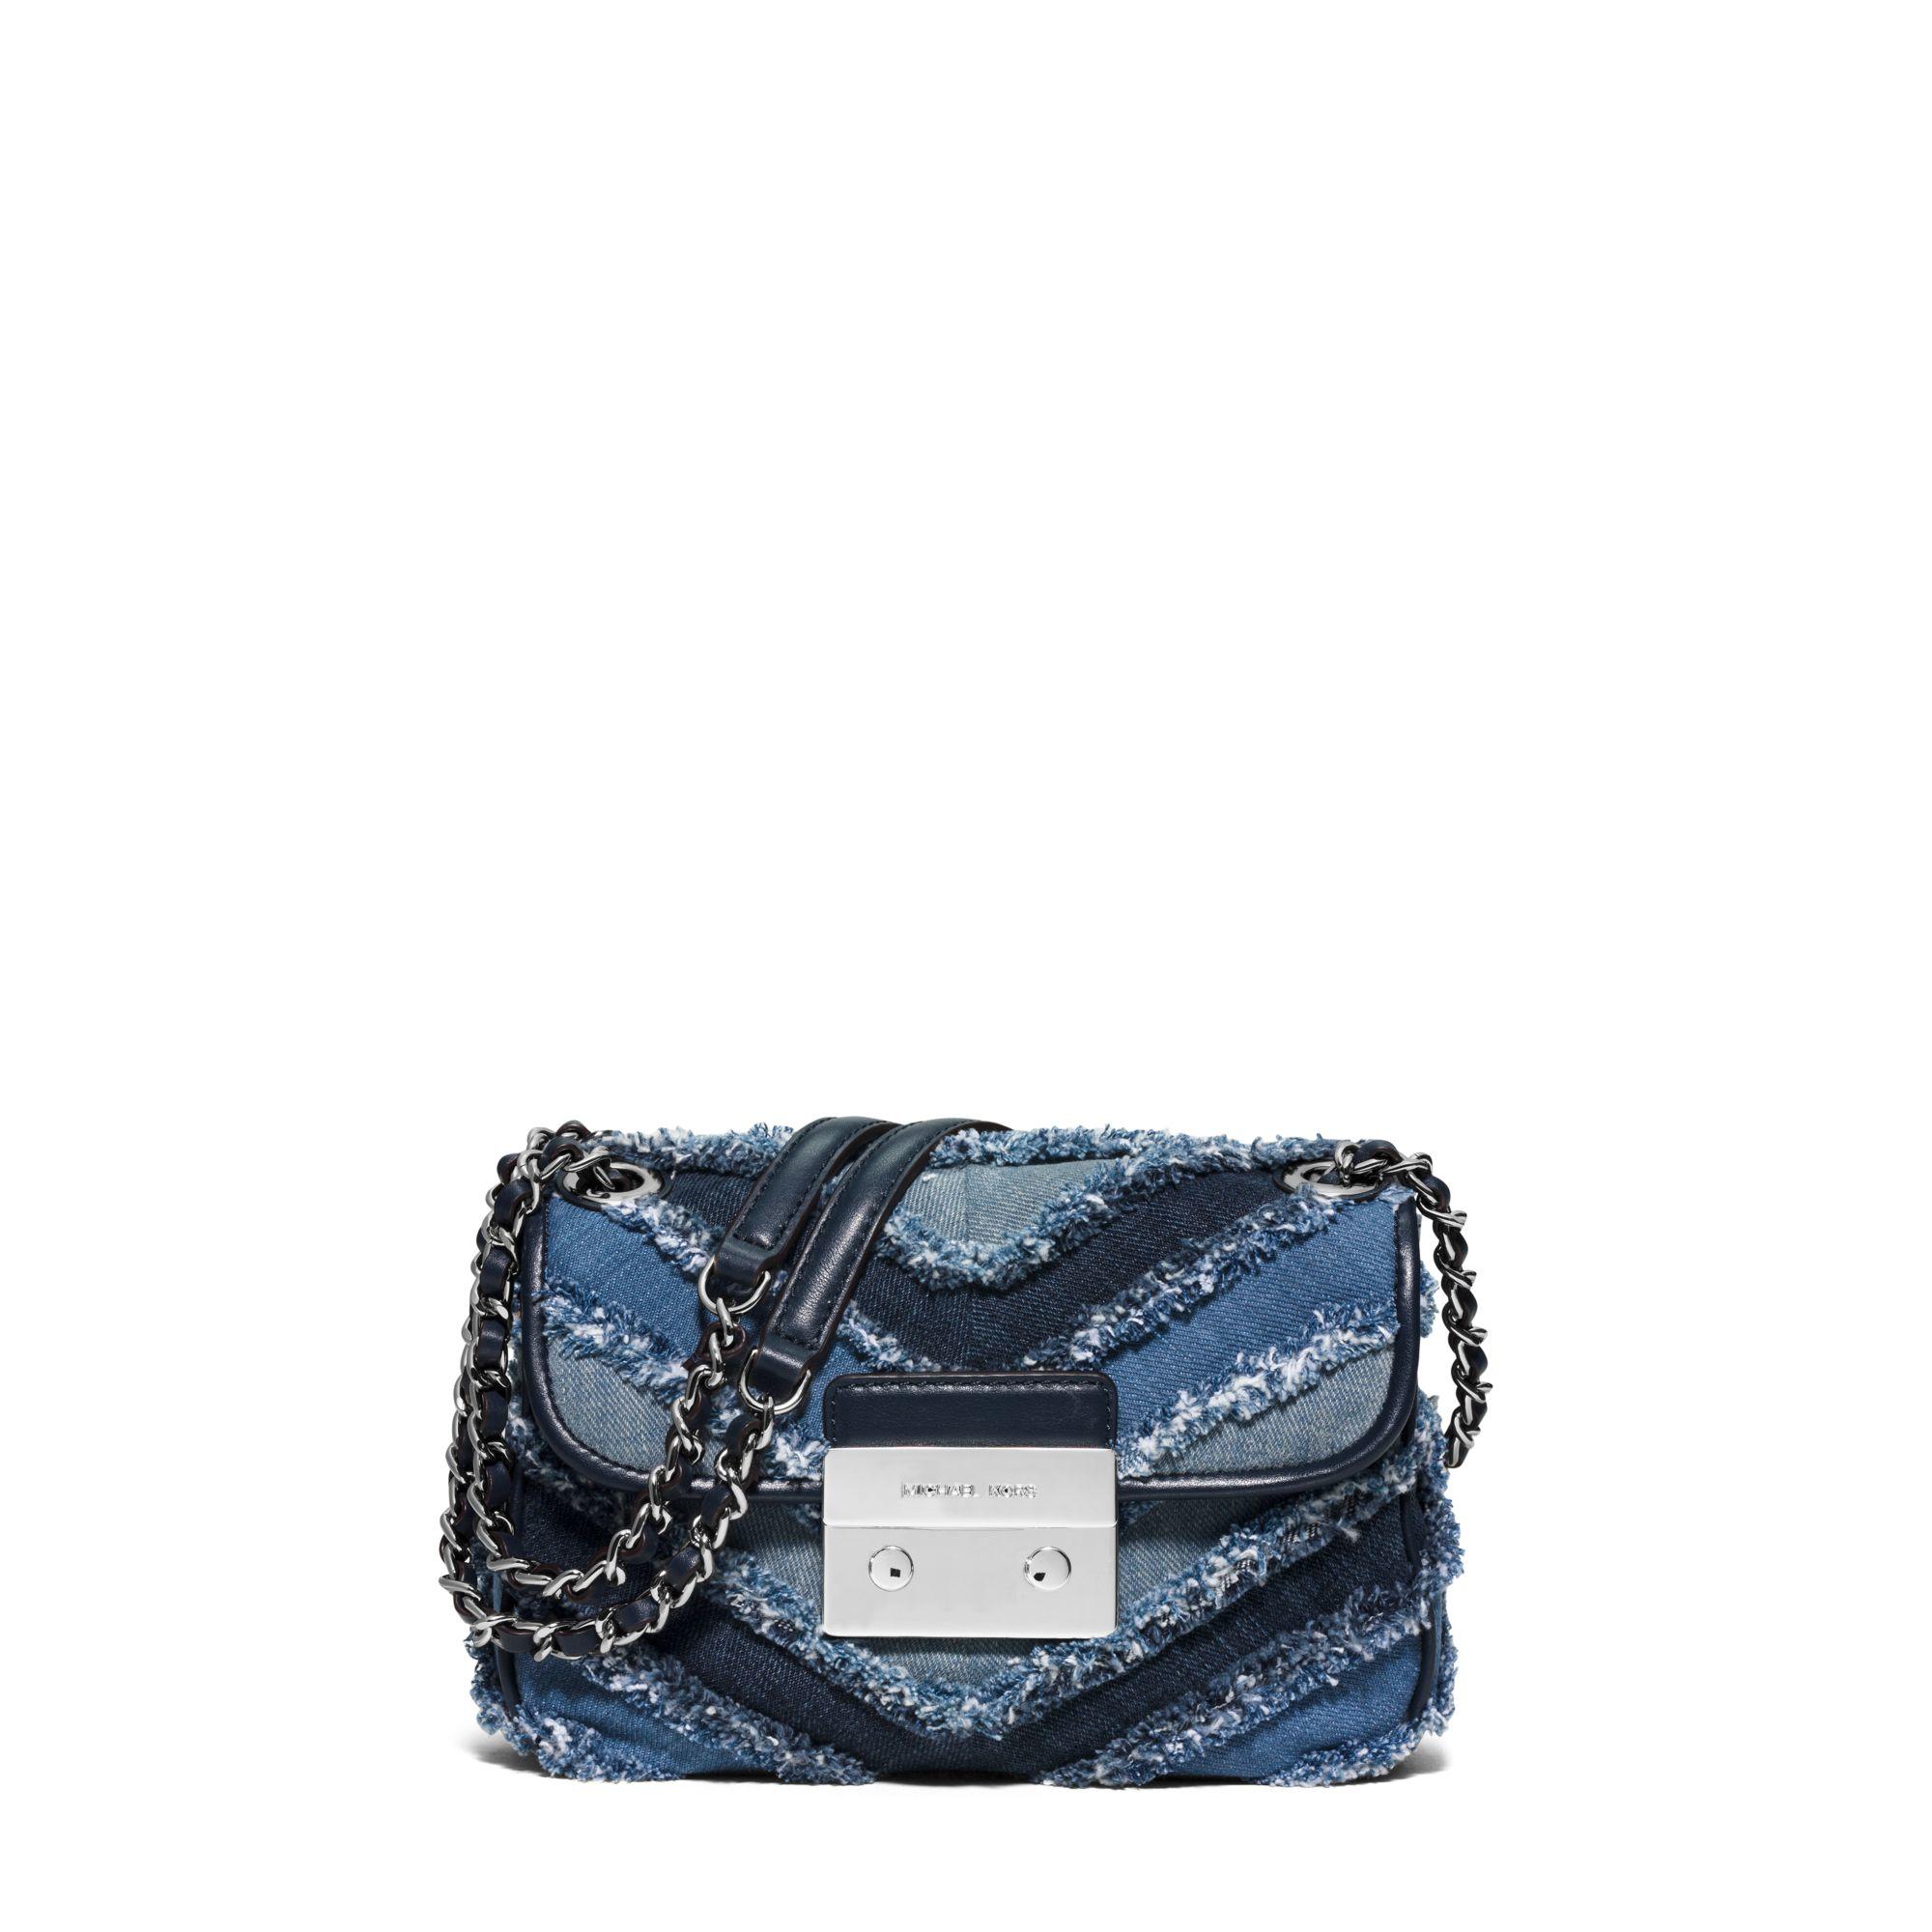 Lyst - Michael Kors Sloan Small Denim Chevron Shoulder Bag In Blue